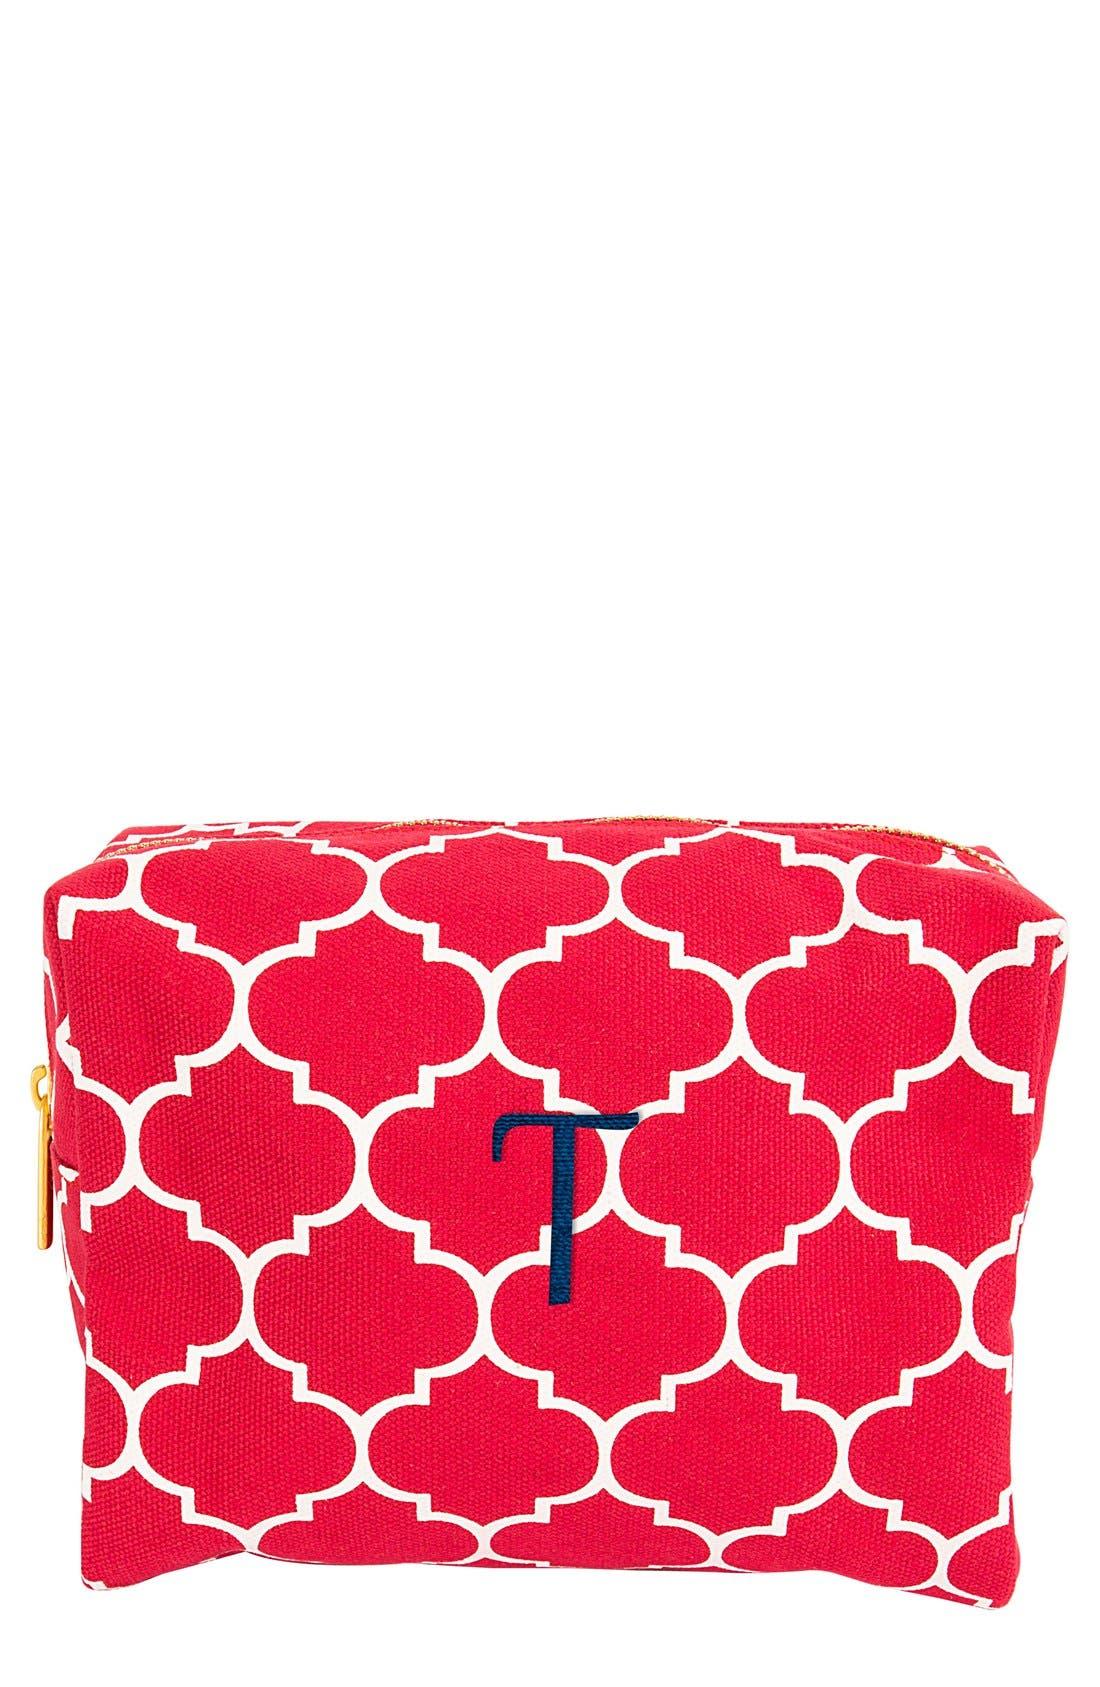 Monogram Cosmetics Bag,                             Main thumbnail 1, color,                             Coral-T